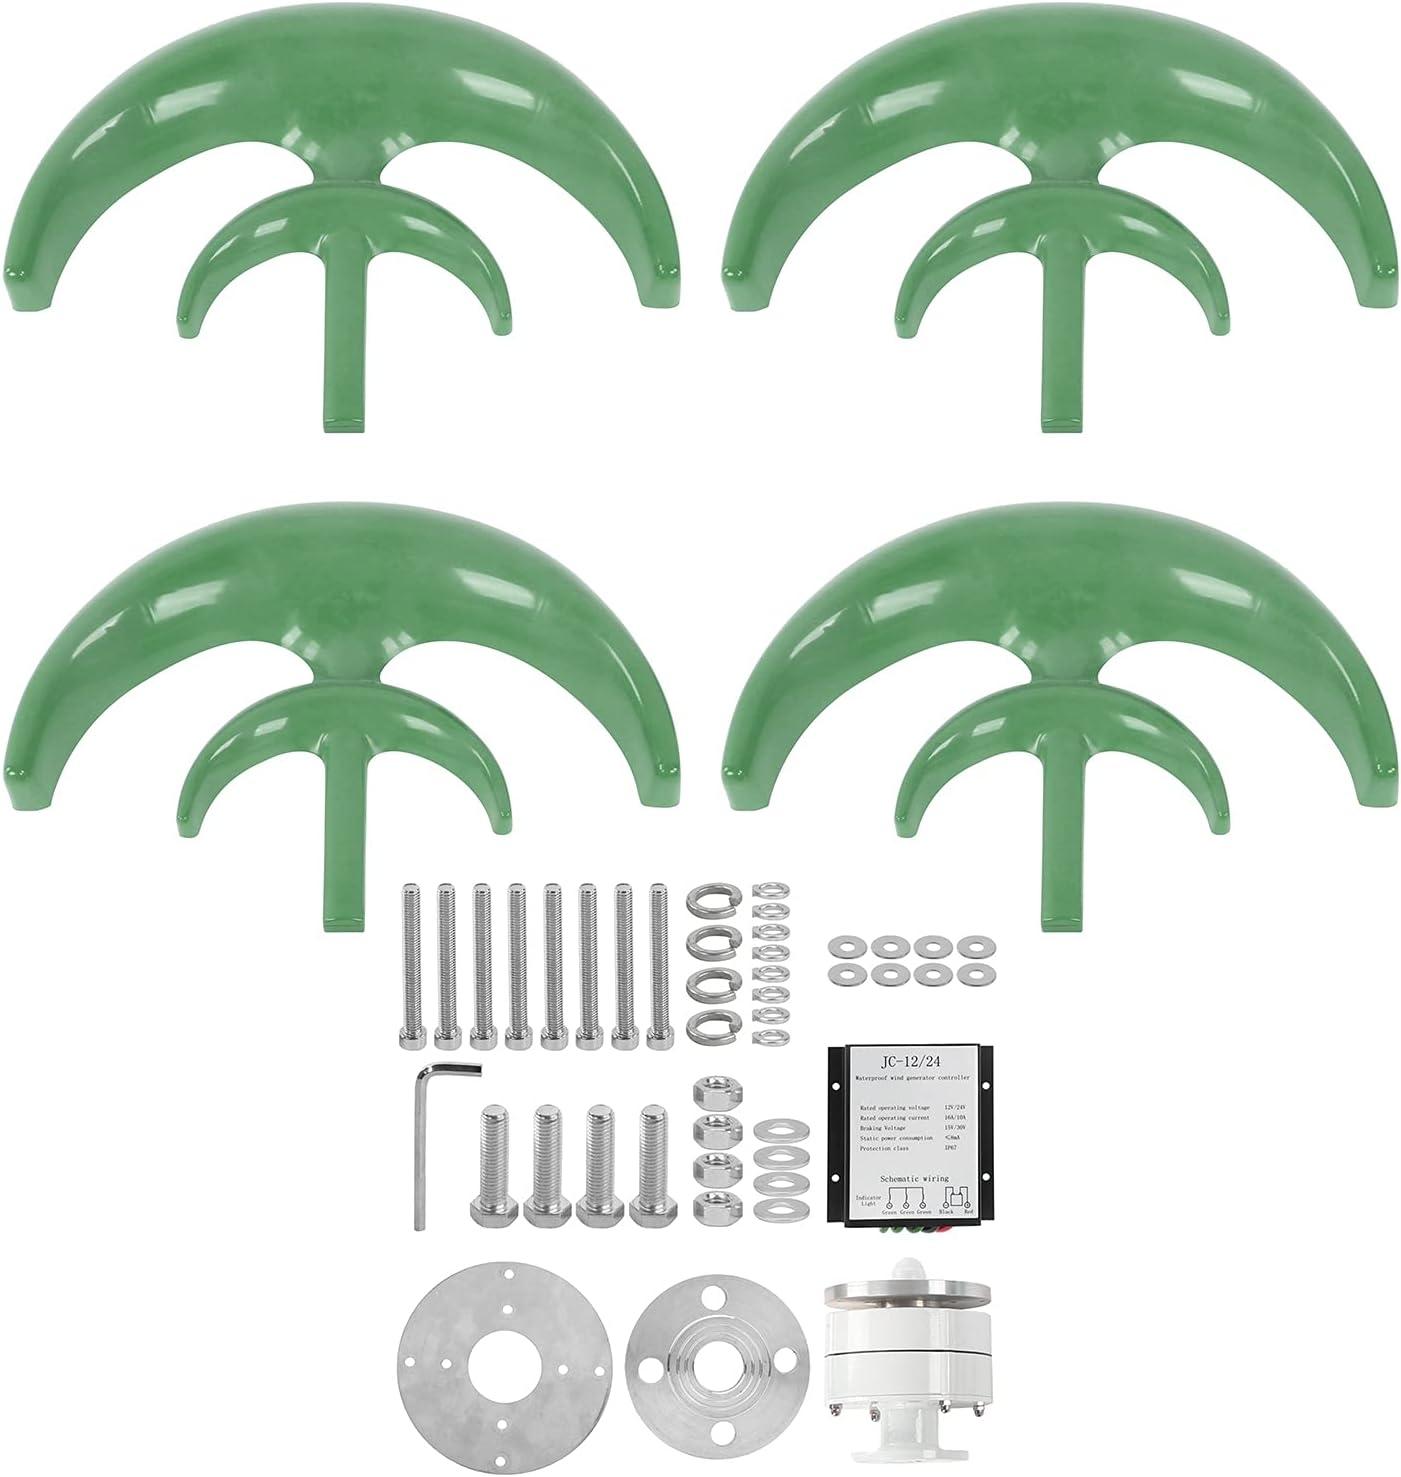 Wind Super beauty product restock Max 89% OFF quality top Power Generator Green Lantern‑Shaped 4 Turbine Blades Win